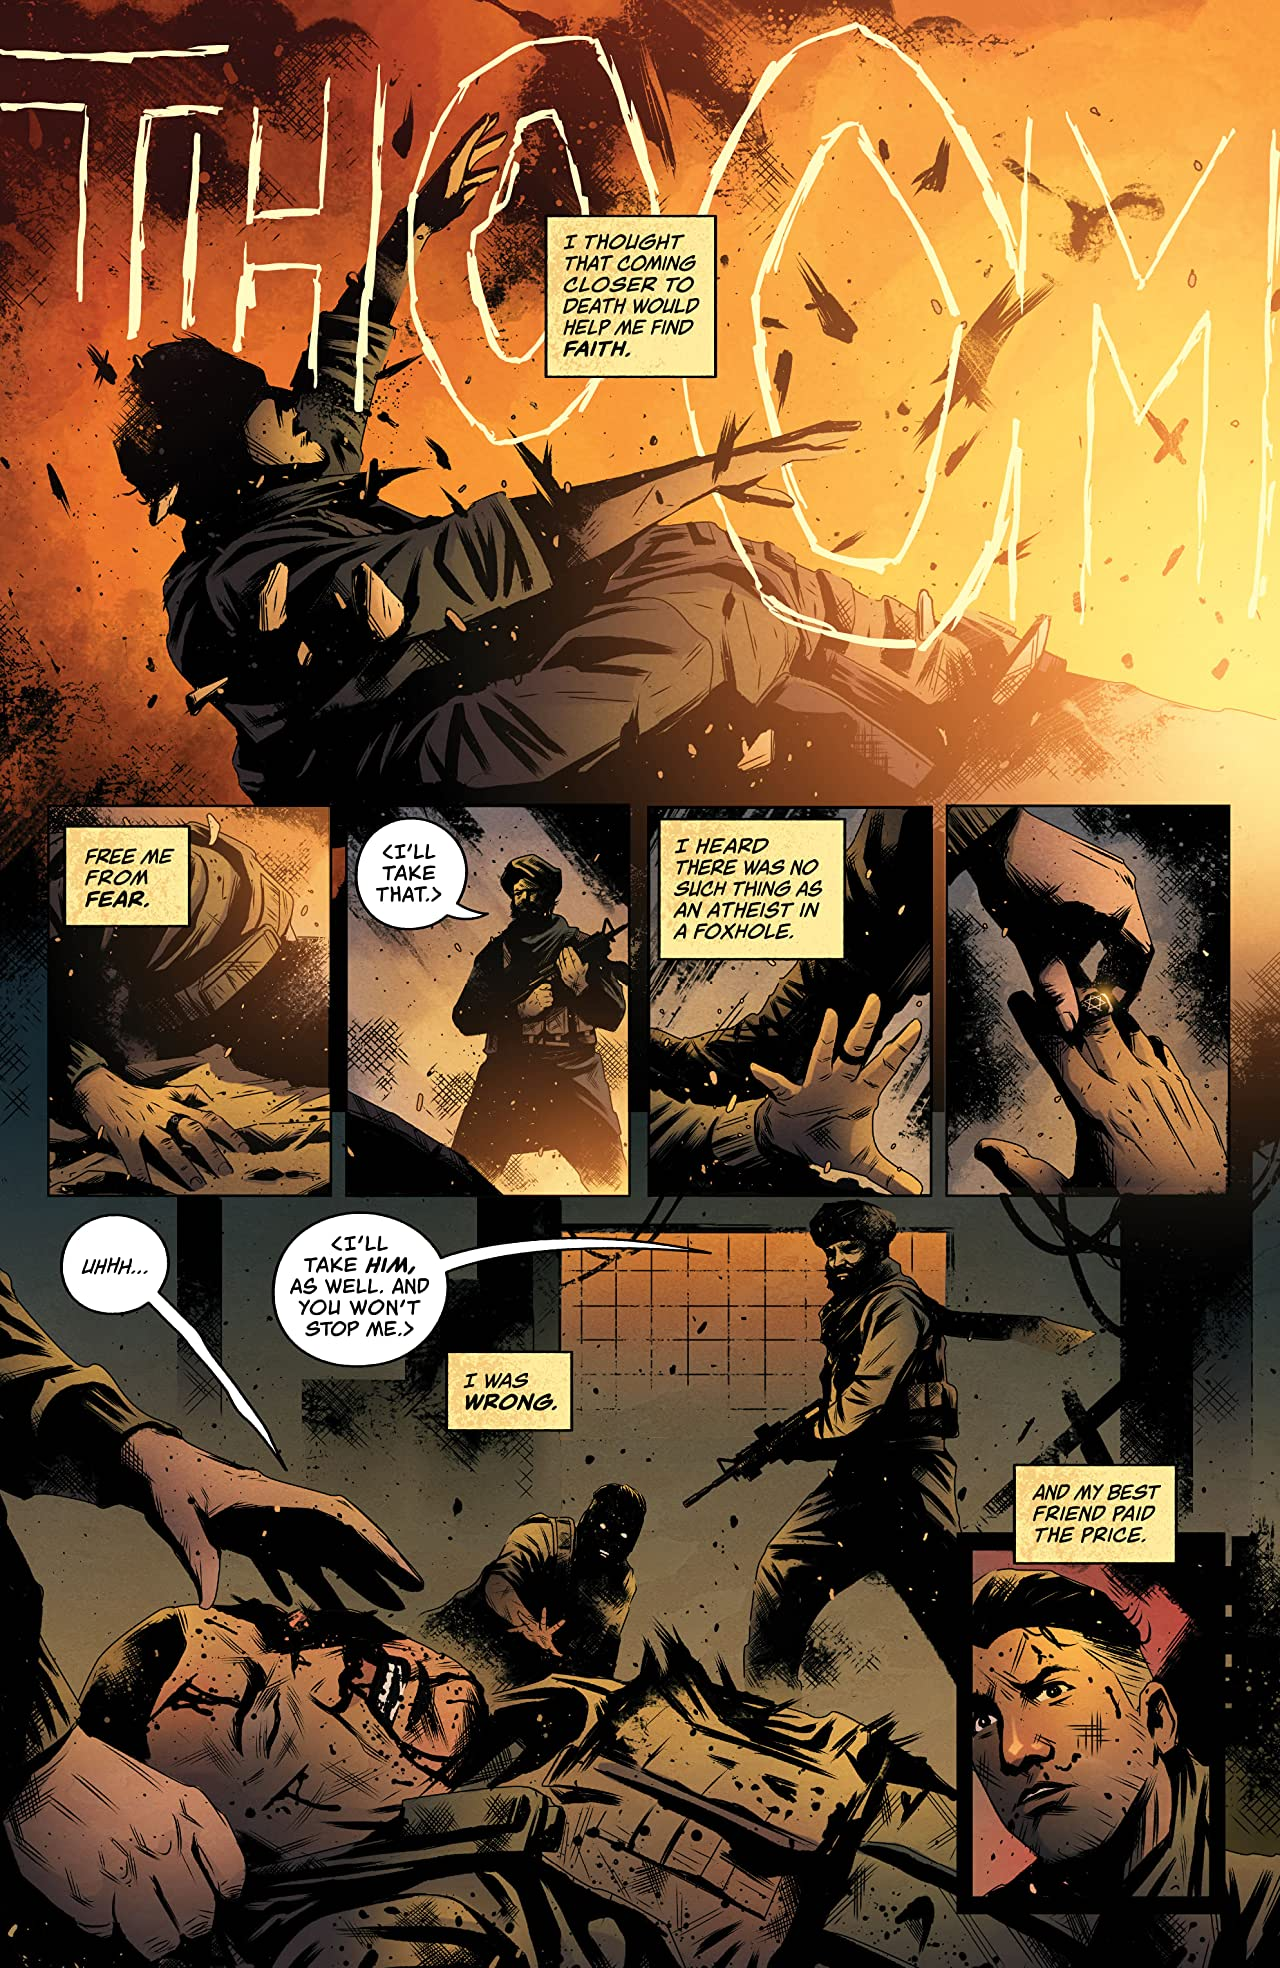 War on Terror Vol. 1: Godkillers